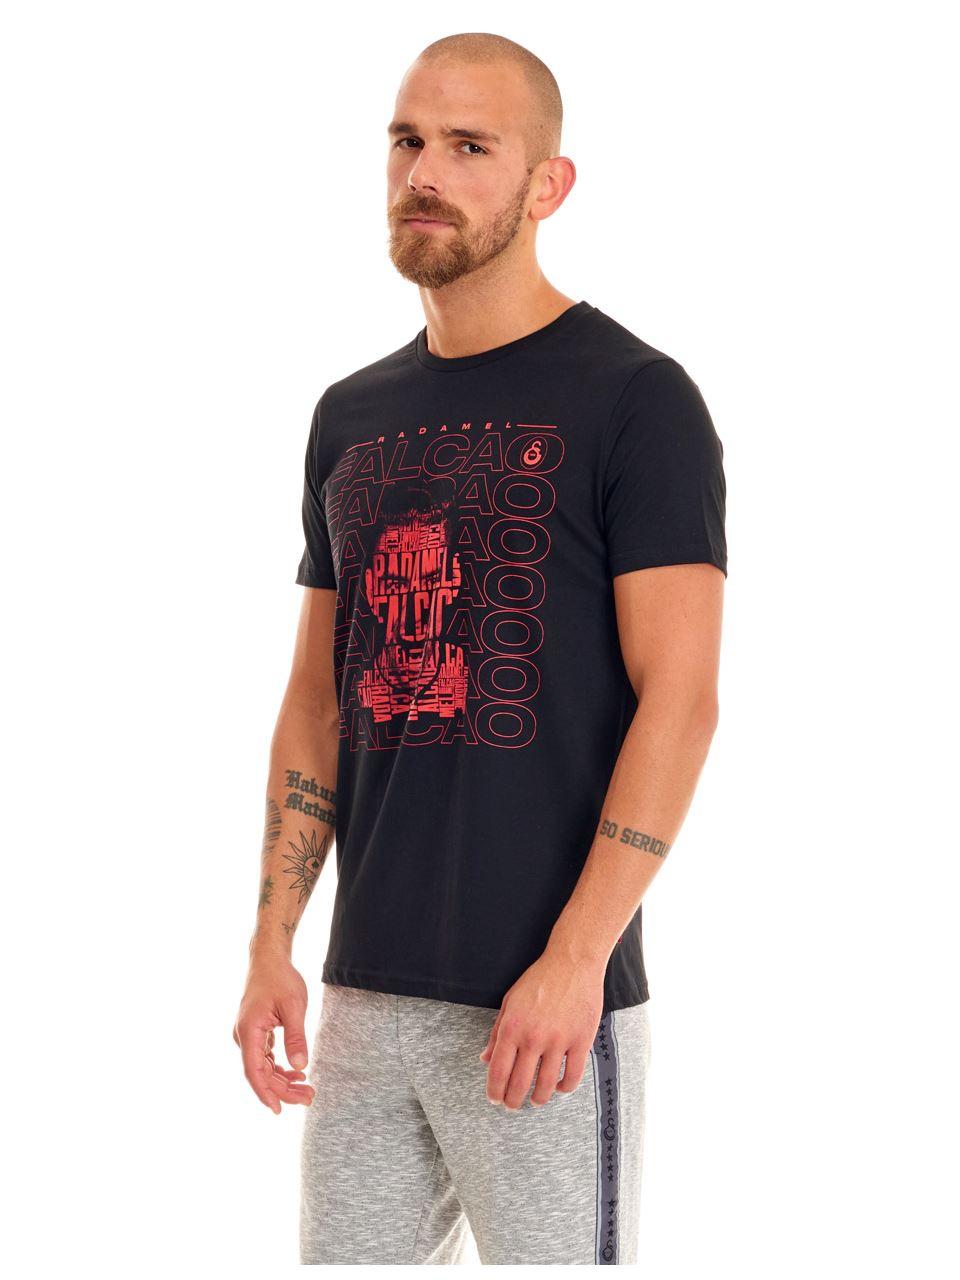 Galatasaray Falcao Erkek T-shirt E191281